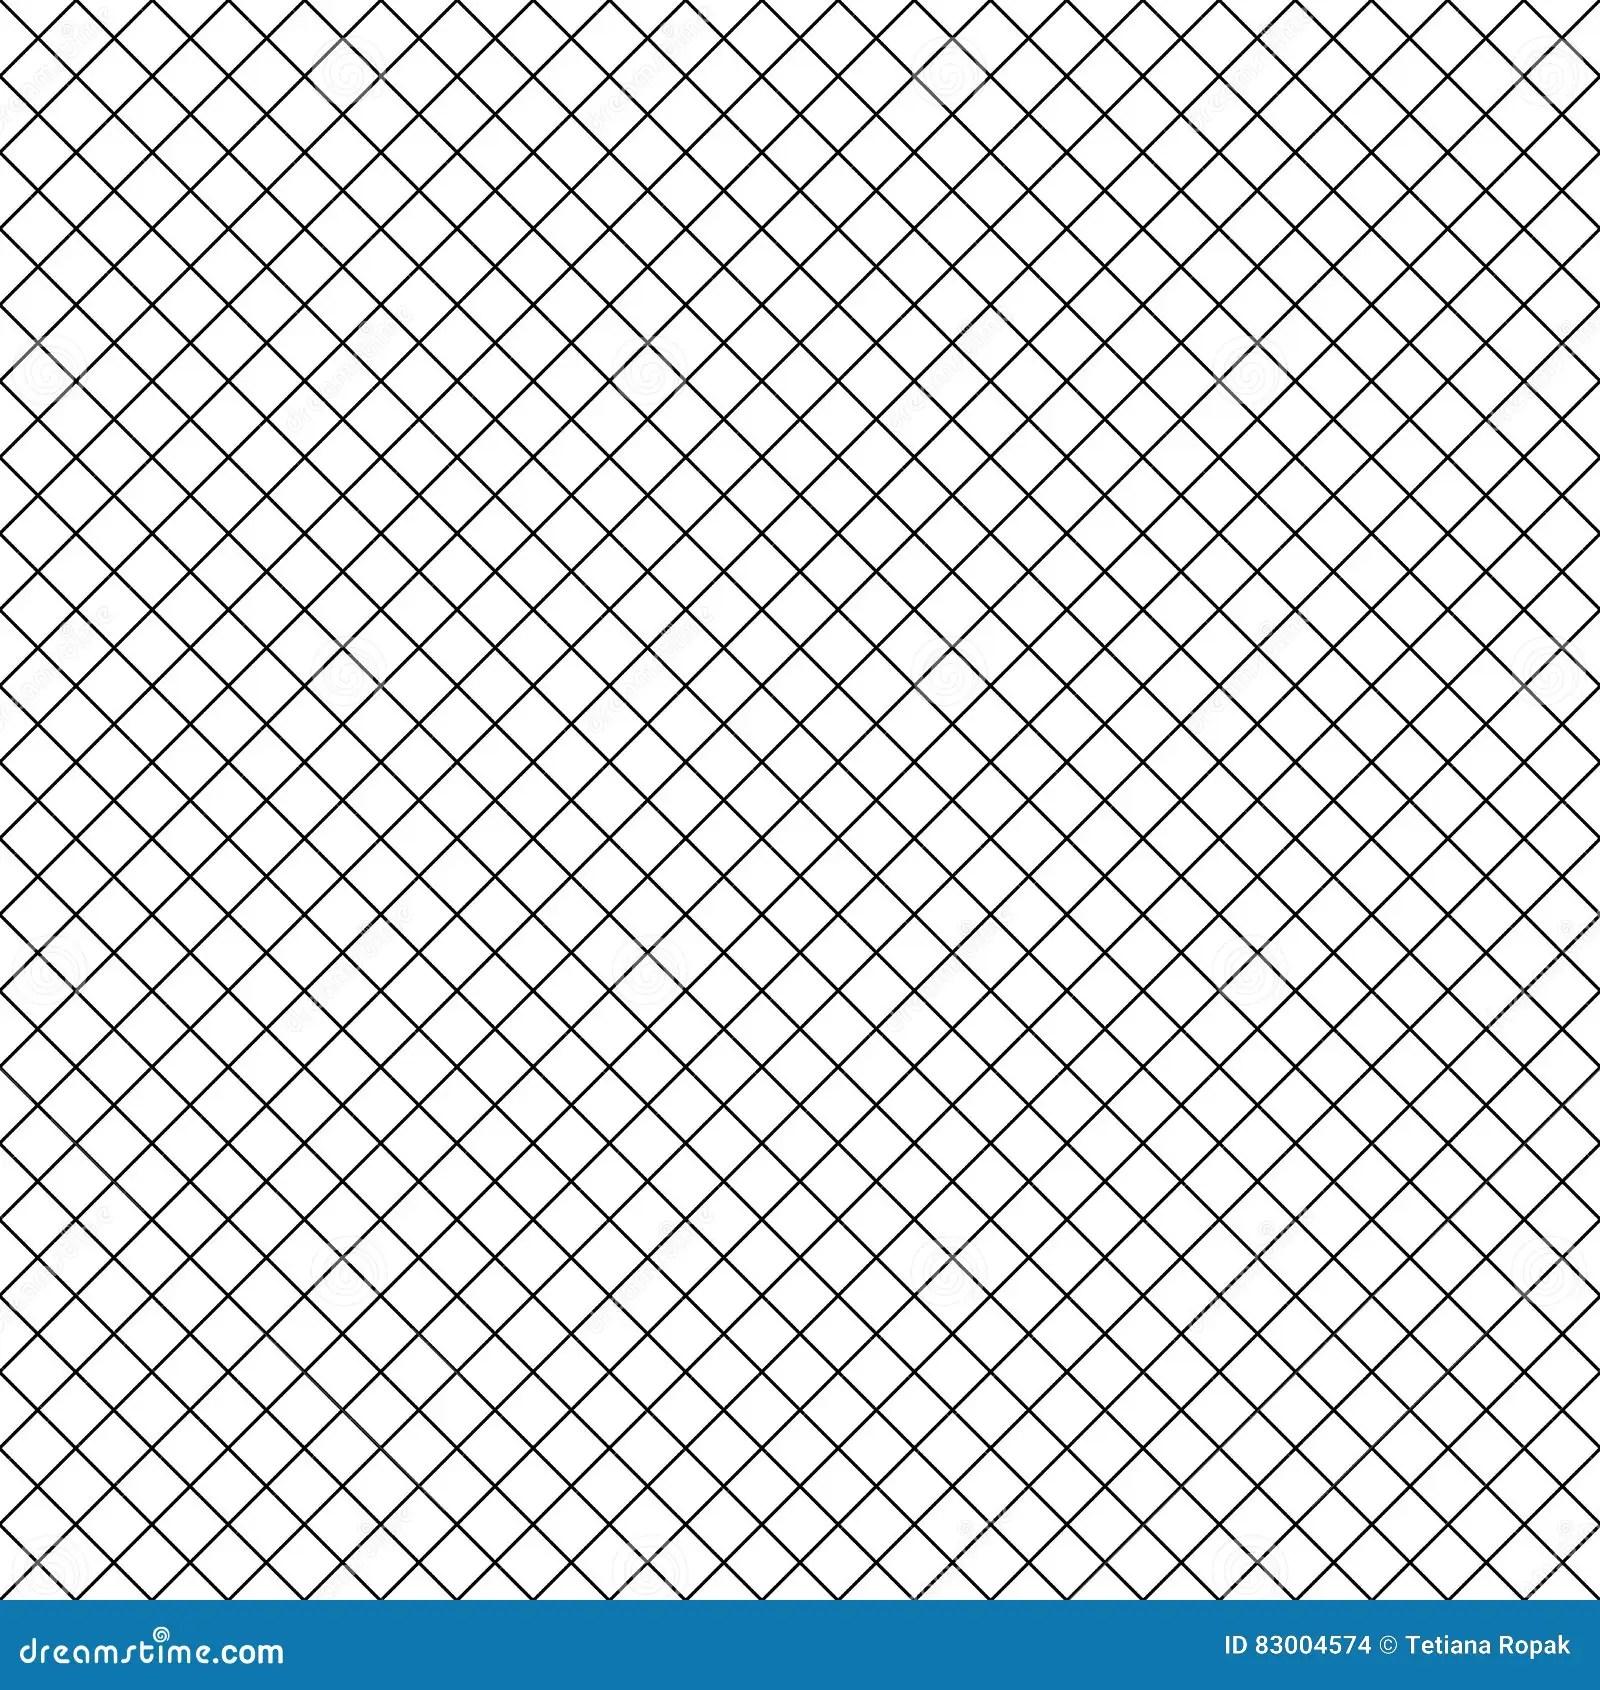 Abstract Futuristic Grid. Vector Illustration Vector